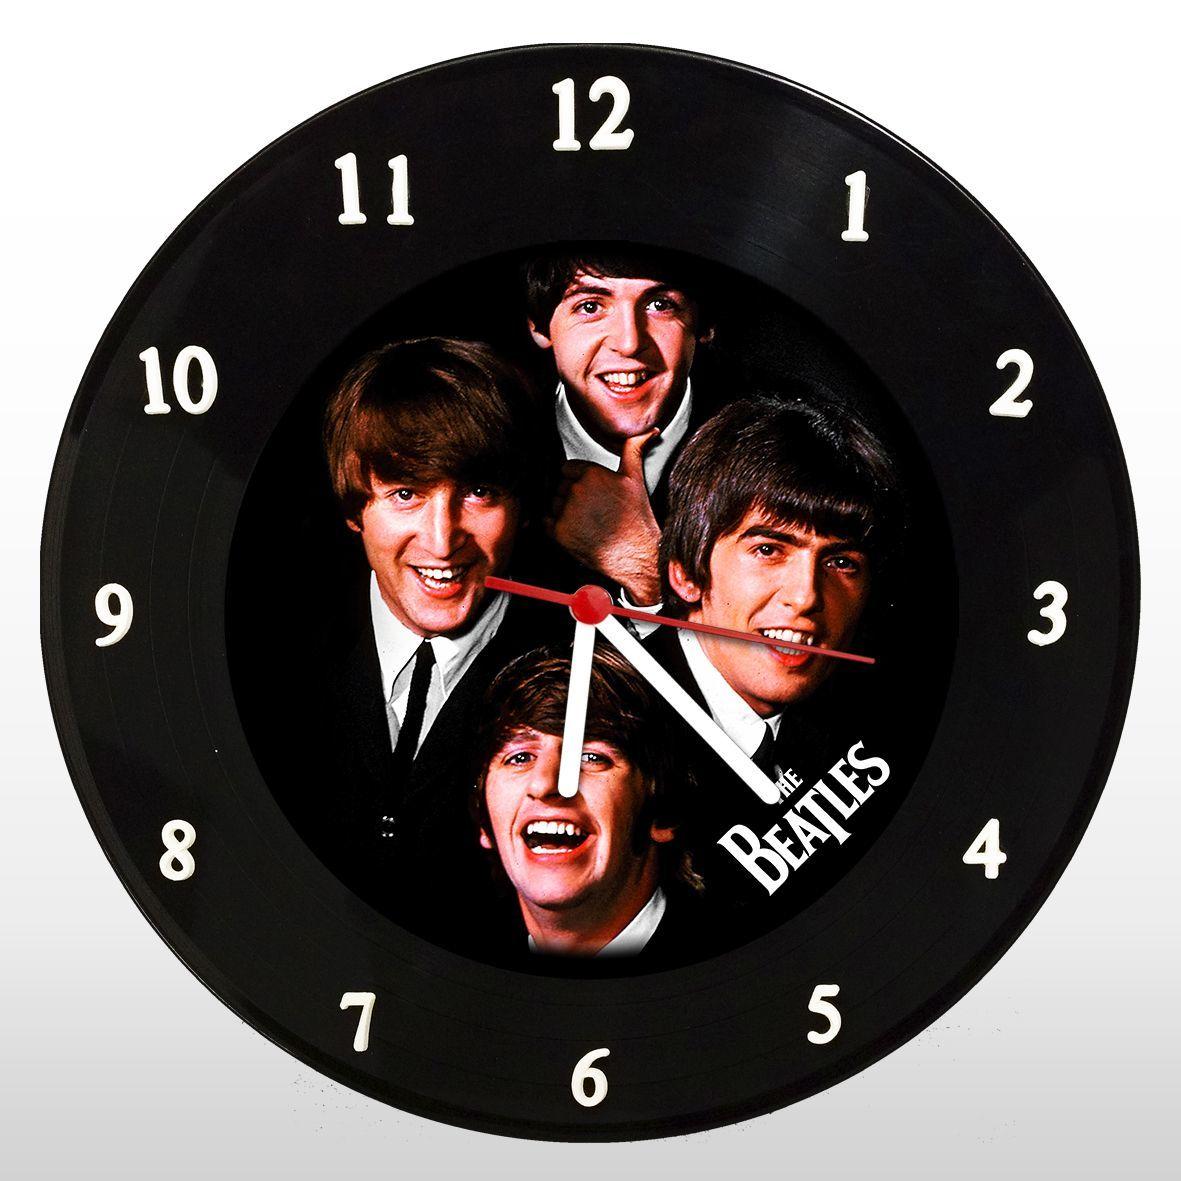 The Beatles - Relógio de Parede em Disco de Vinil - Mr. Rock